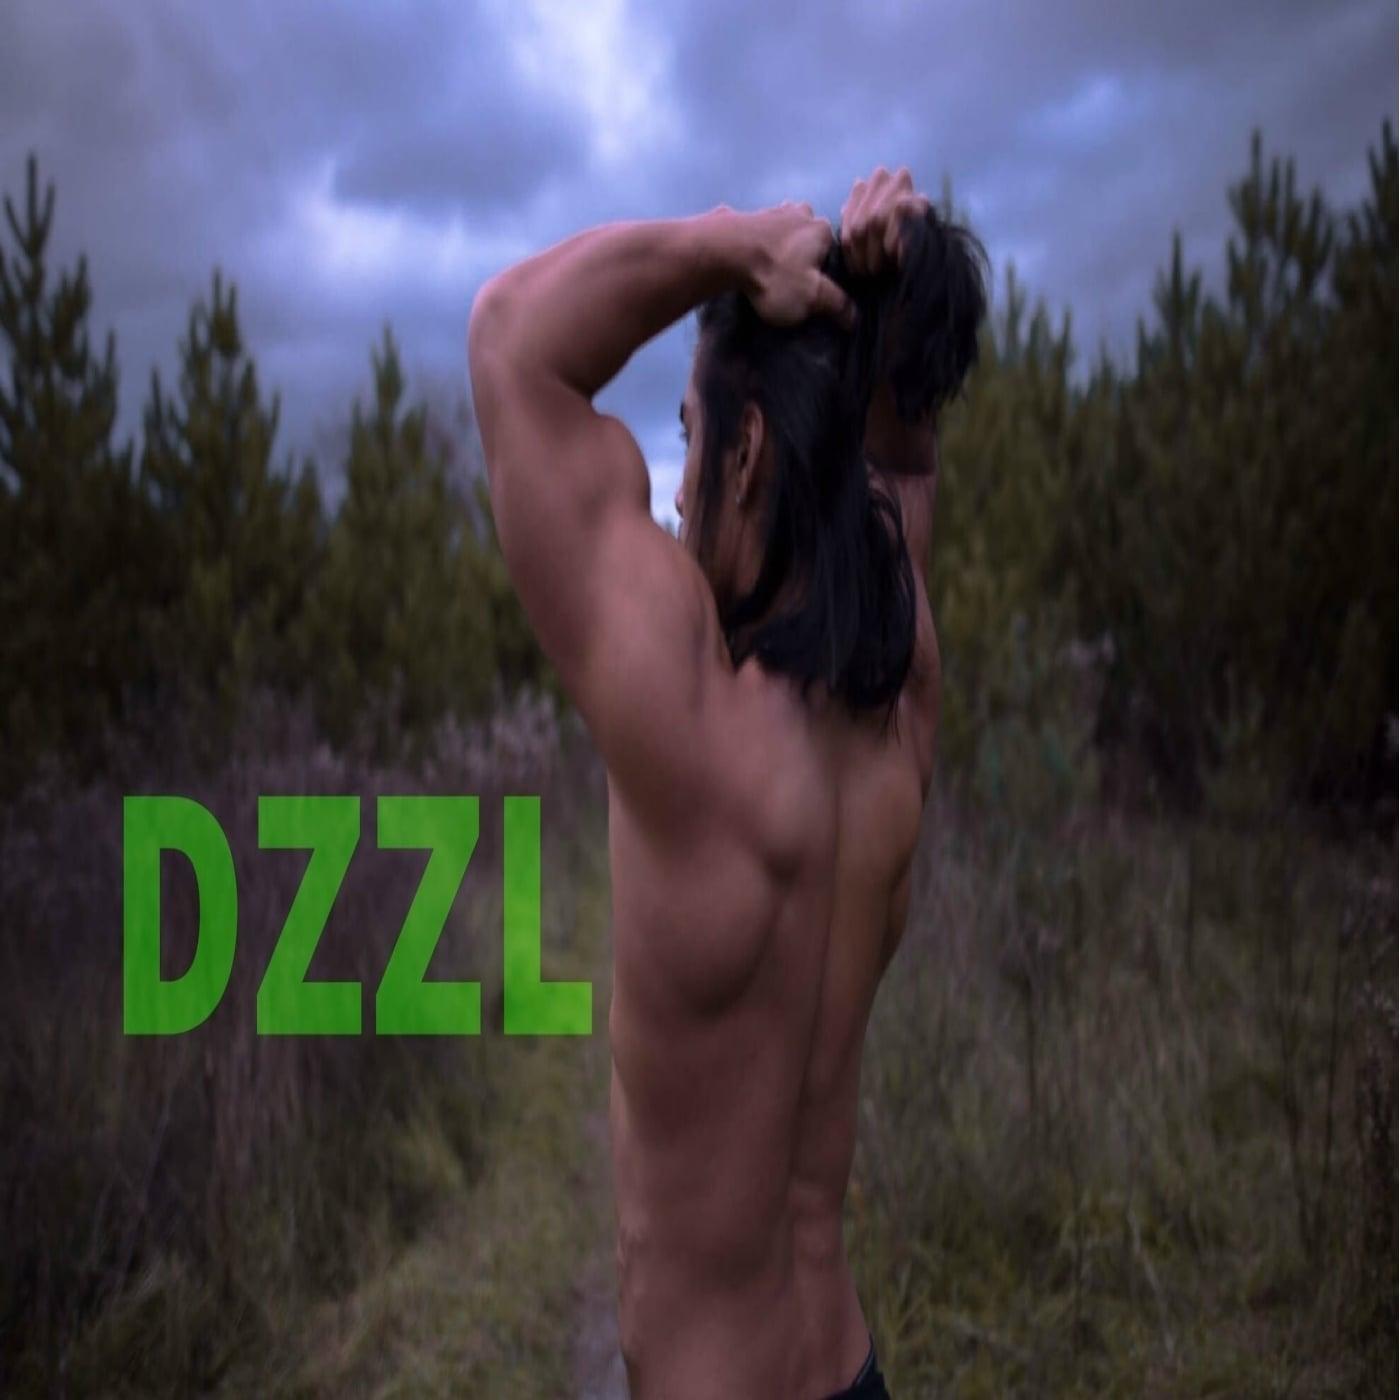 Dzzl Talk - Jonny Dzzl